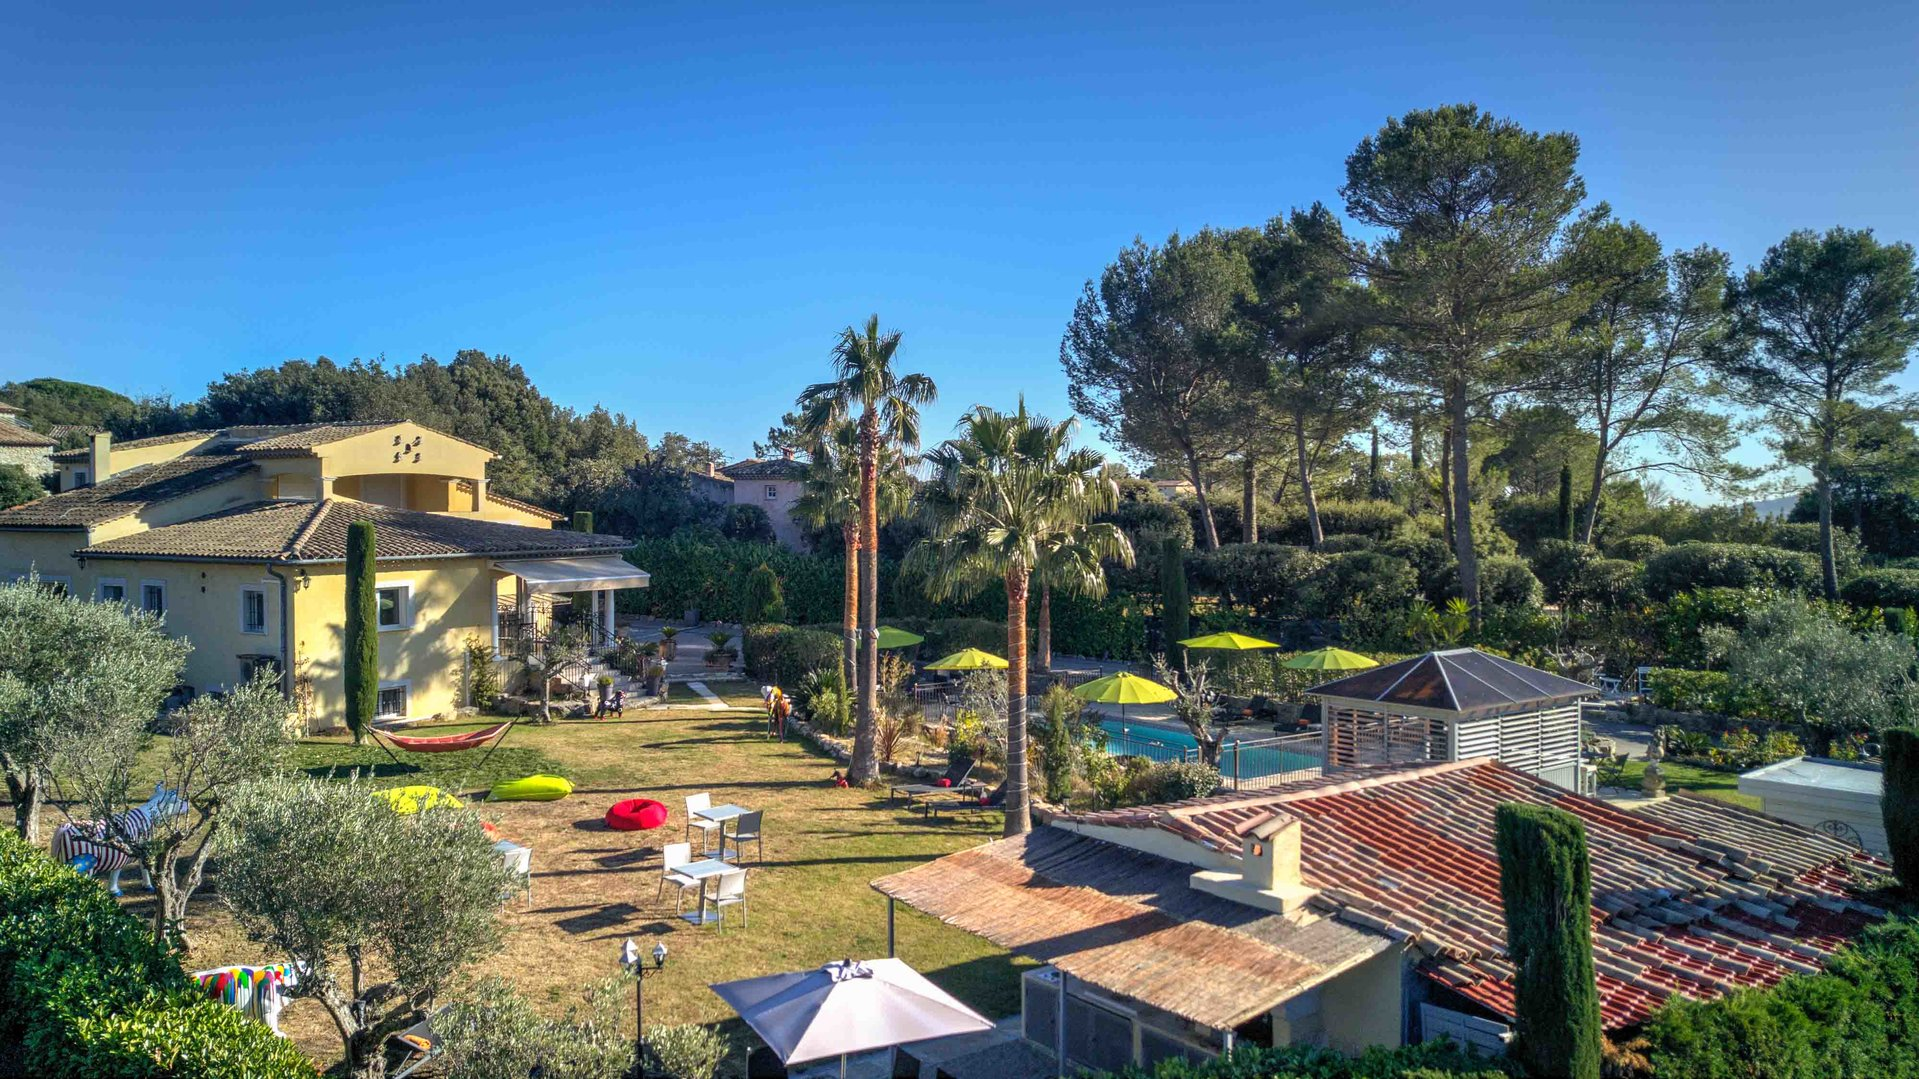 Grasse St Jacques, 7 bedrooms Villa